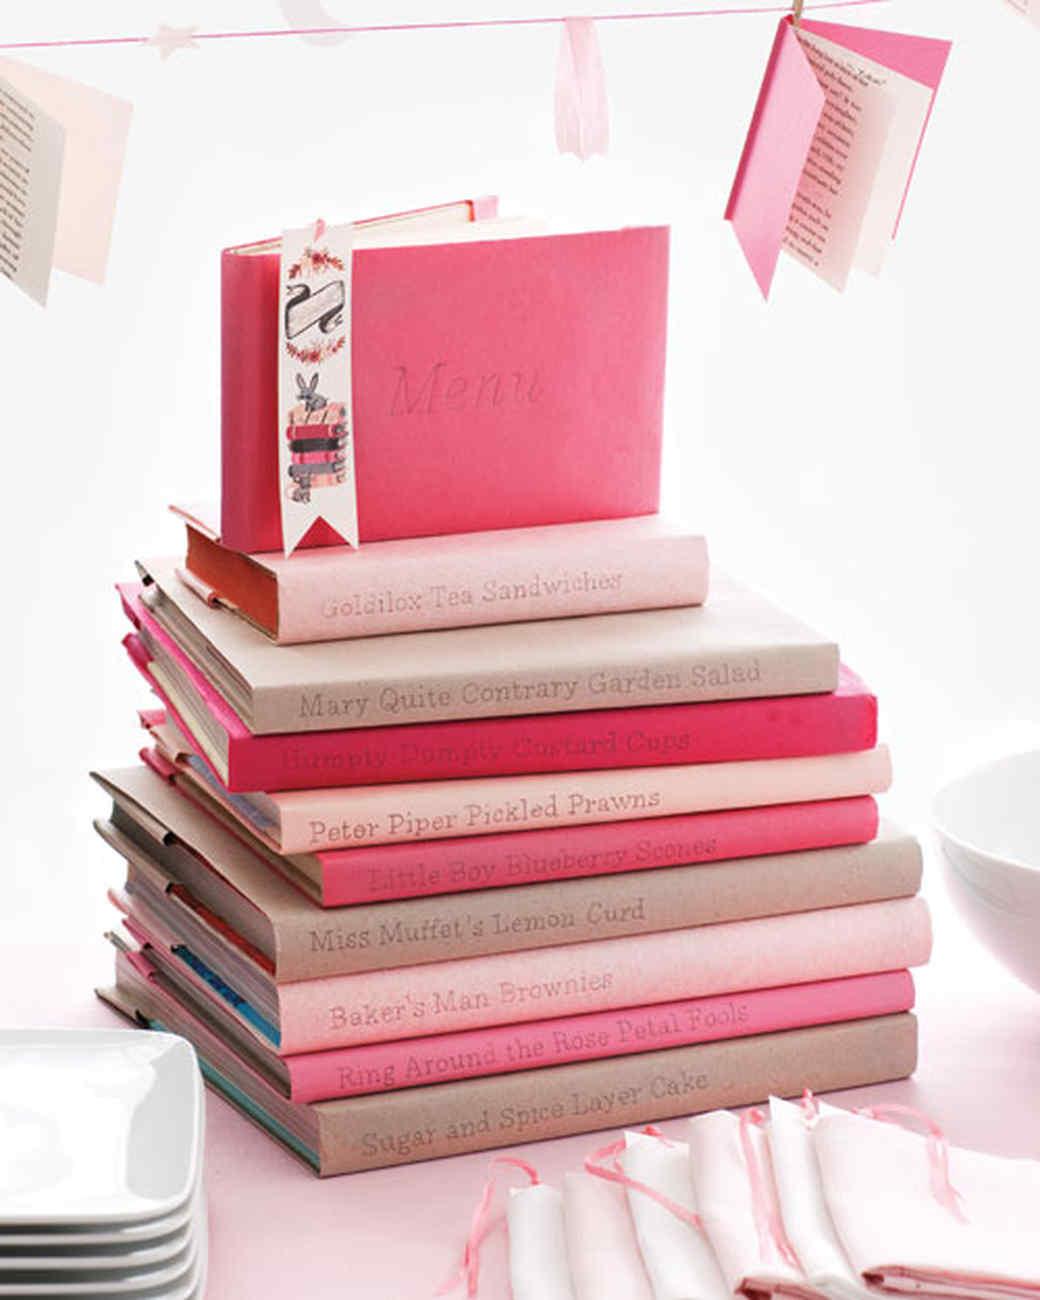 bookstack-0511mld106104.jpg